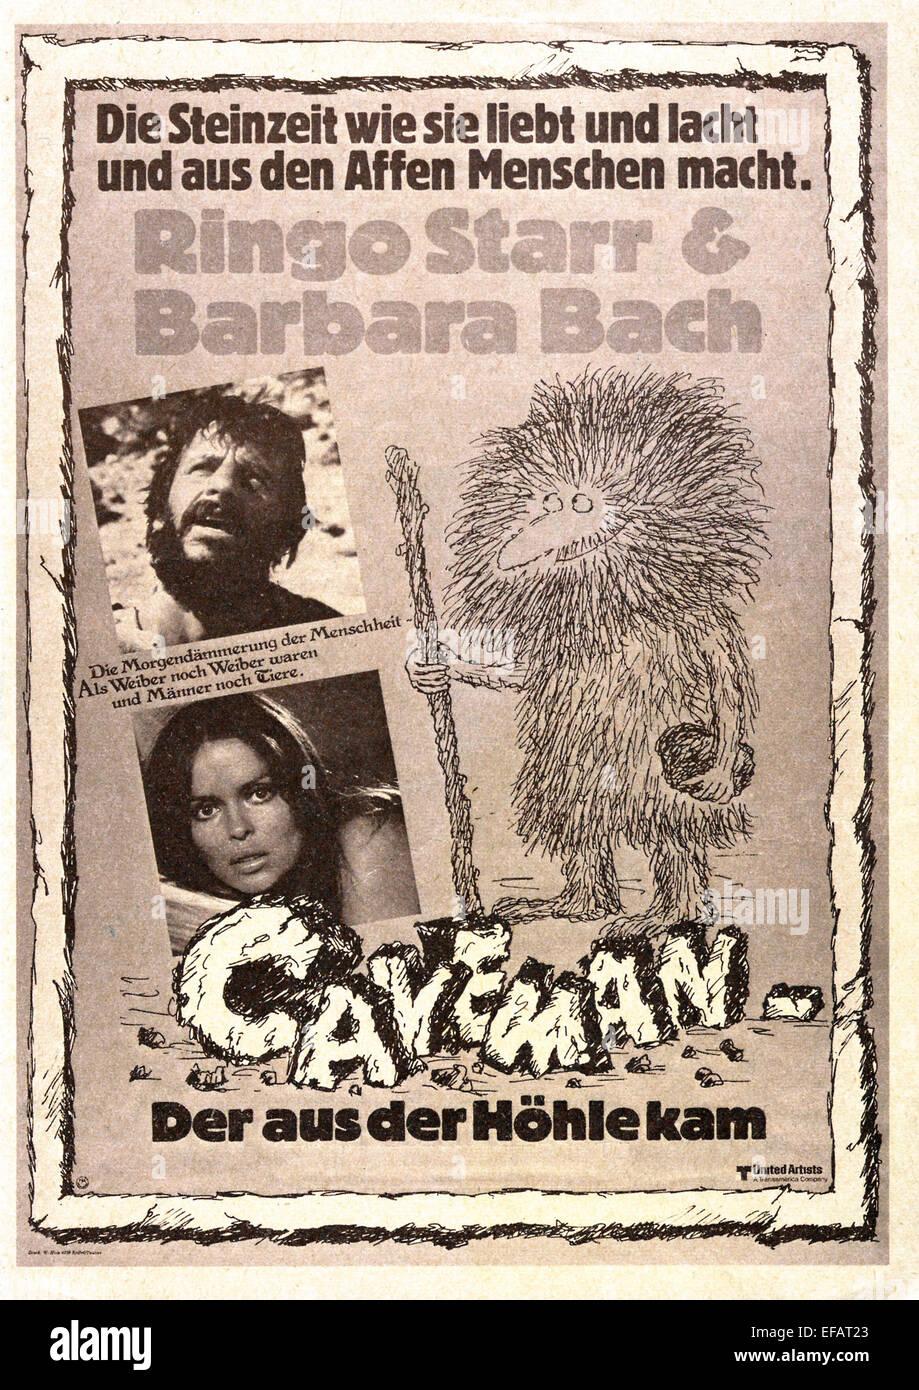 MOVIE POSTER CAVEMAN (1981) - Stock Image